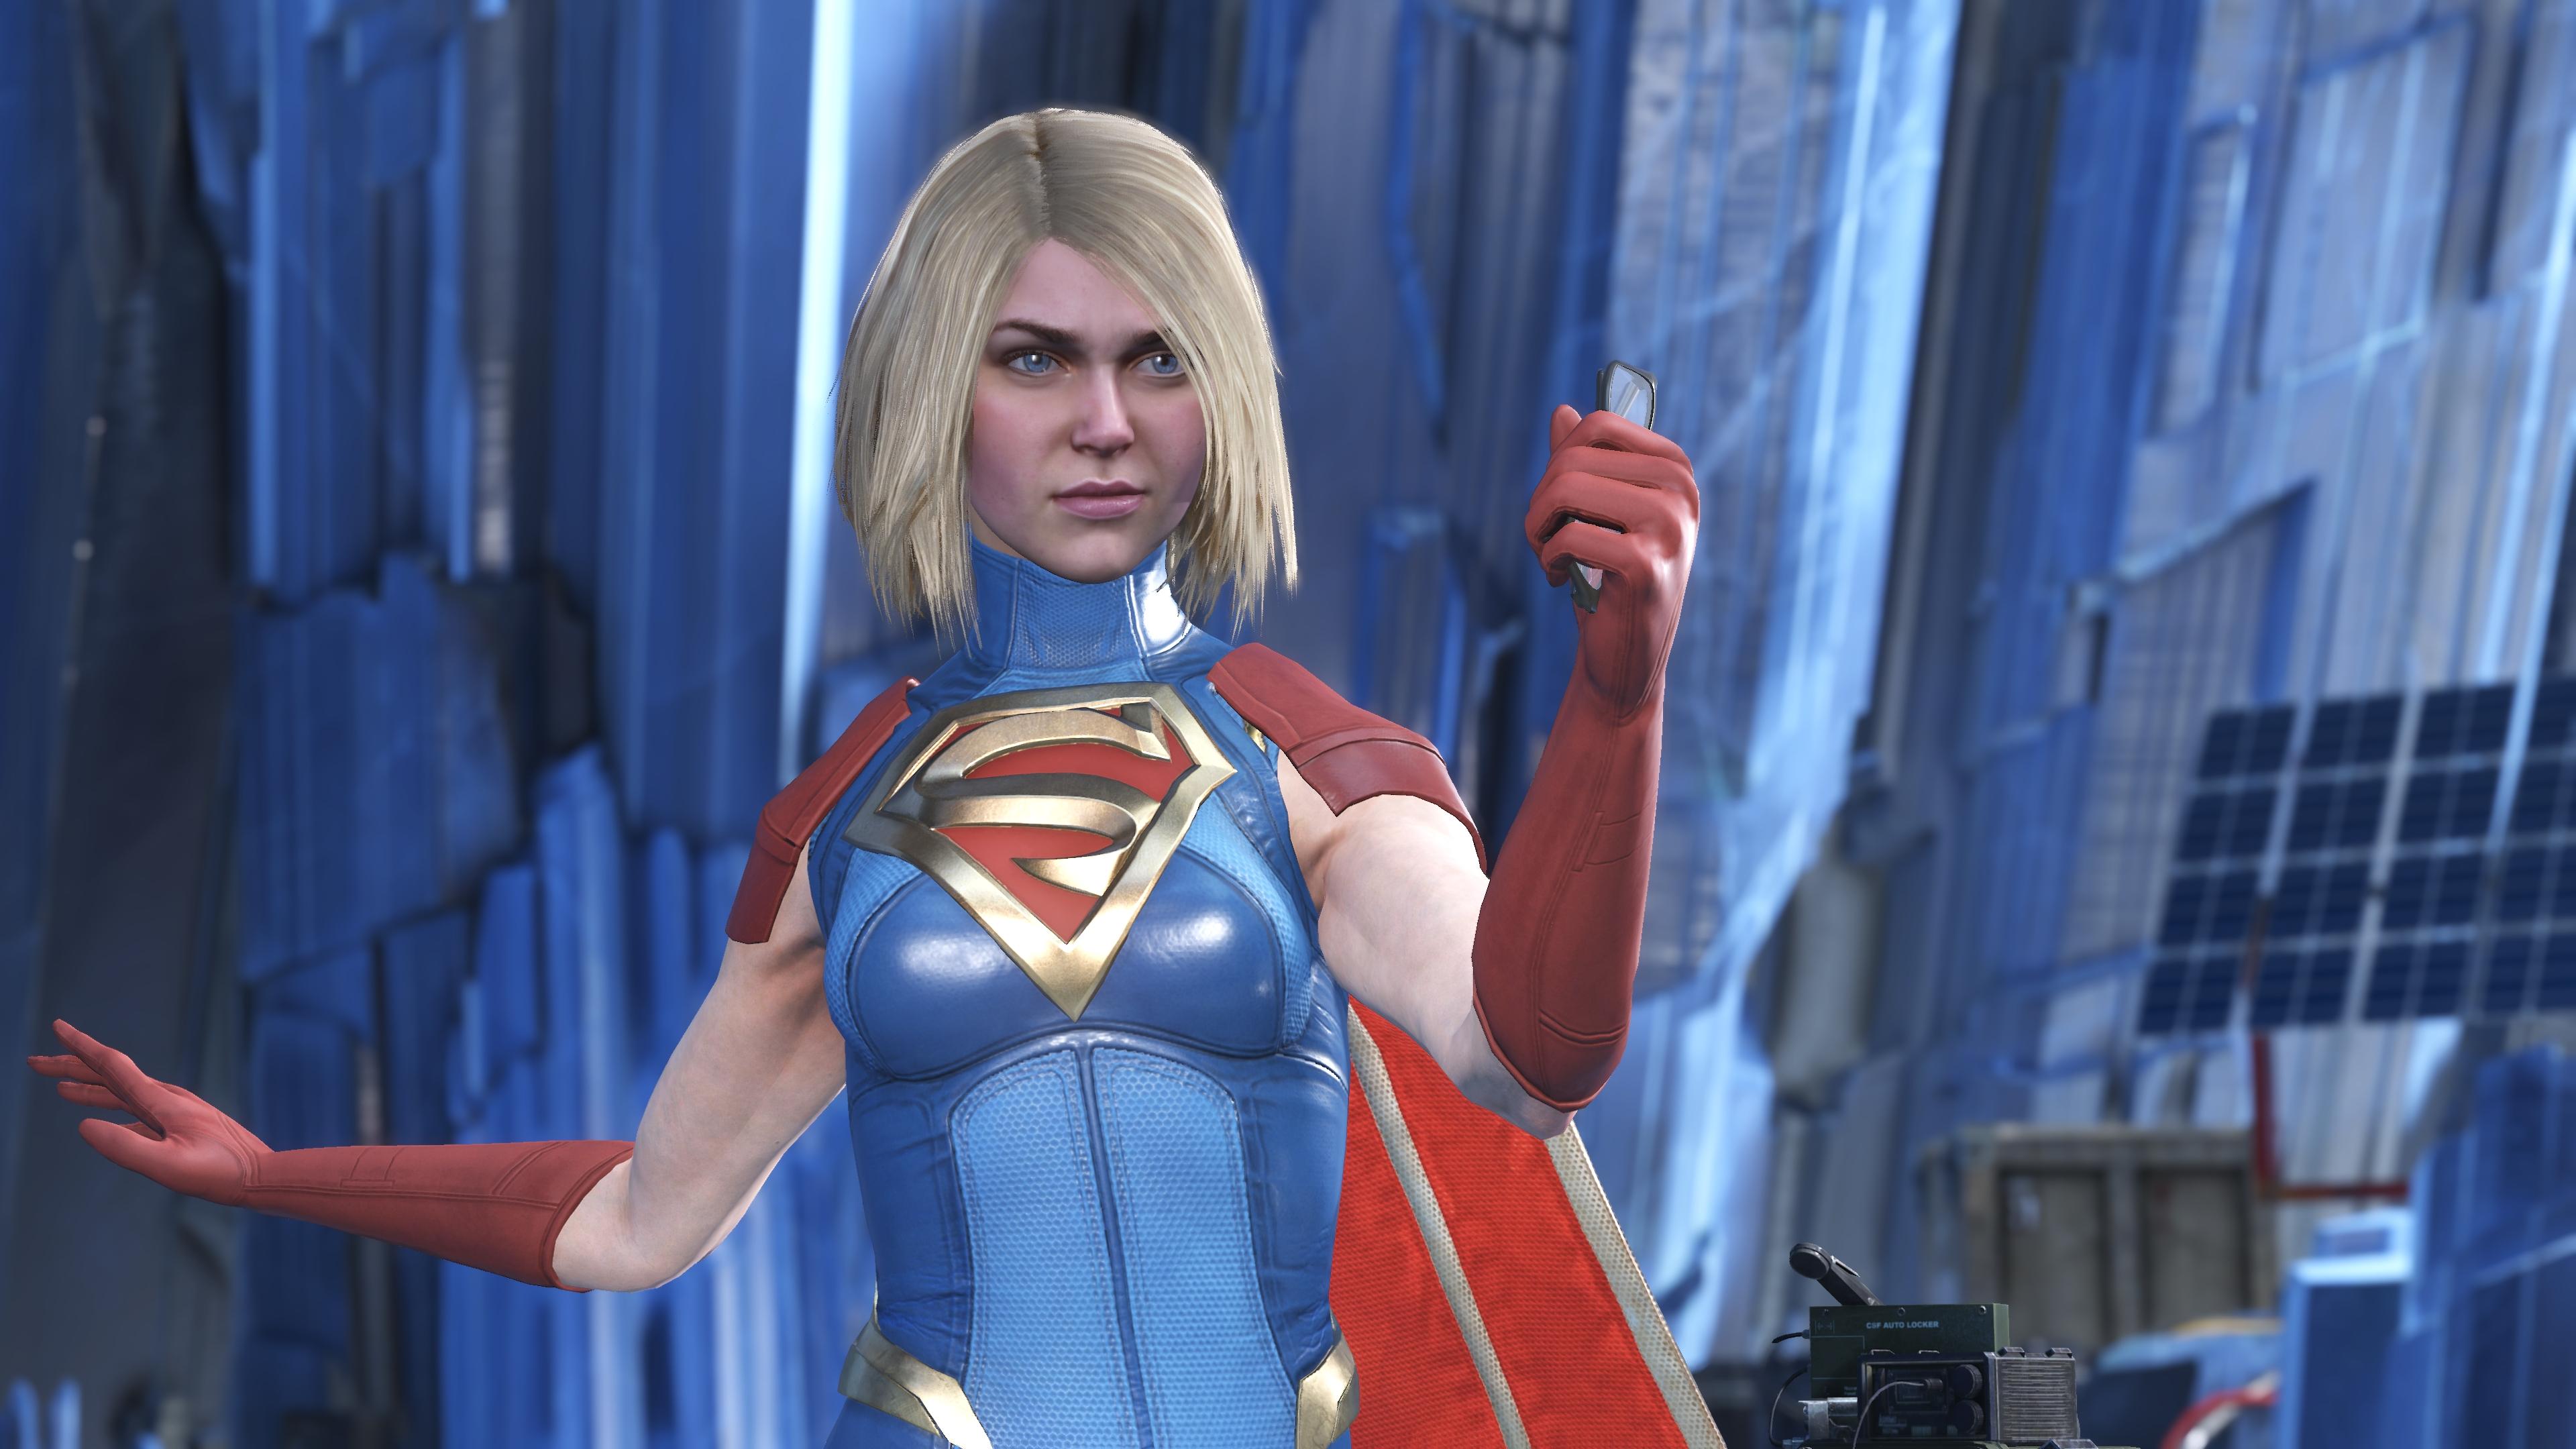 Injustice 2 Supergirl Wallpaper